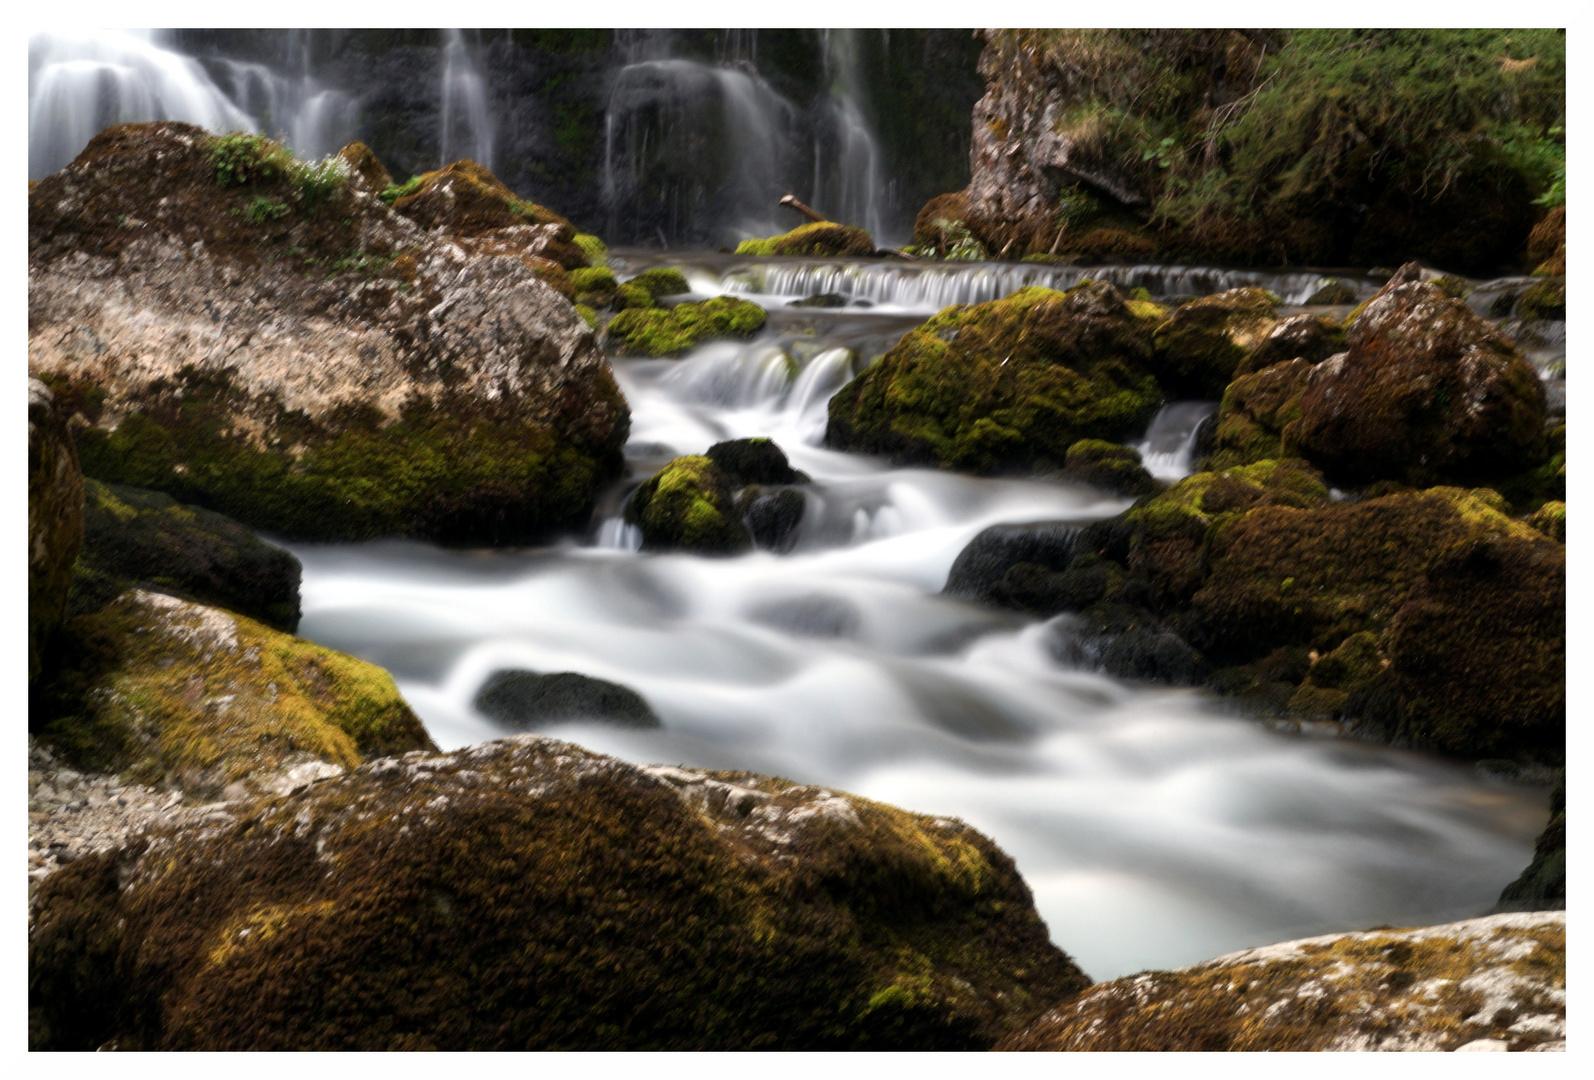 Gollinger Wasserfall 2